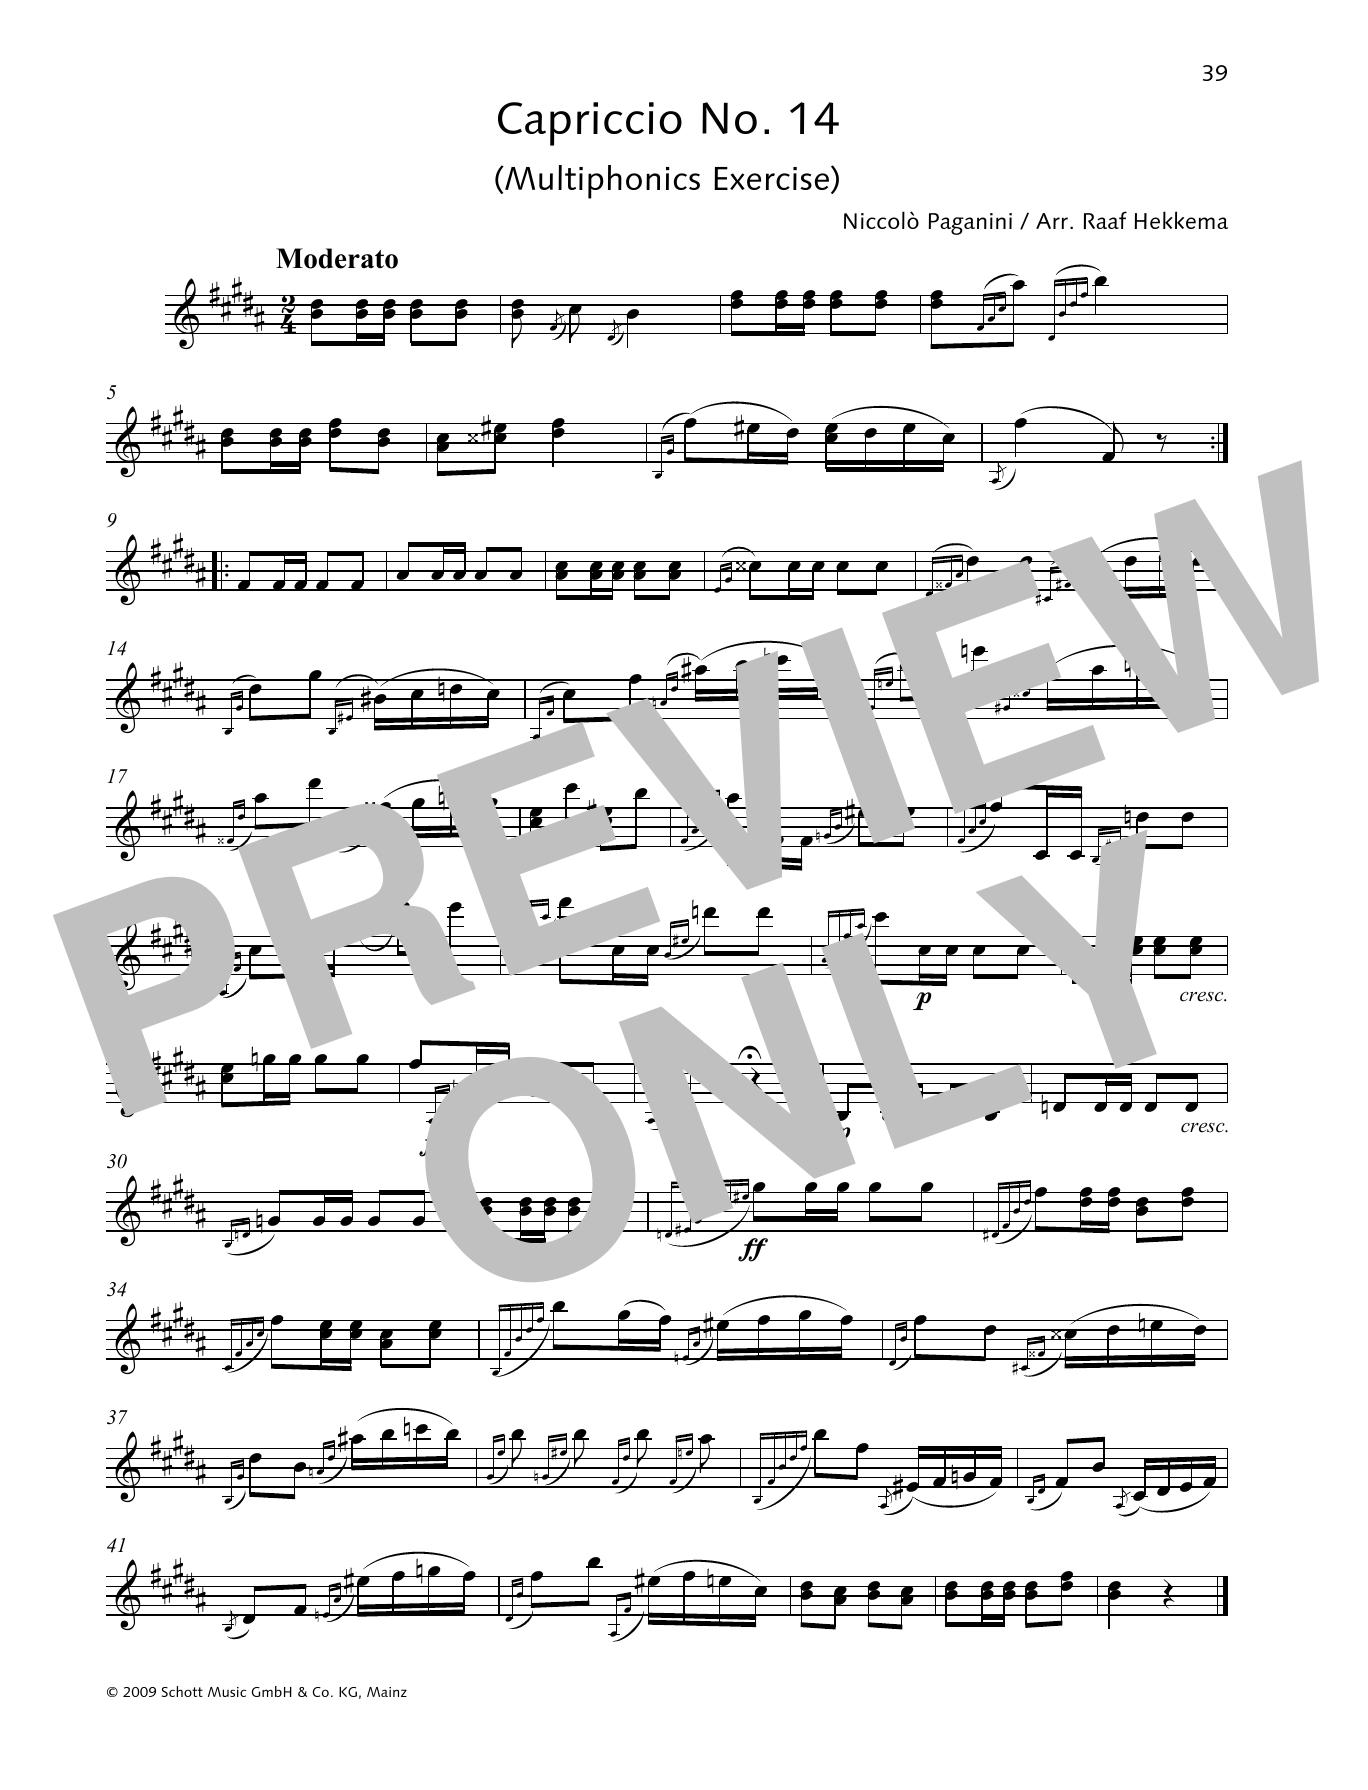 Capriccio No. 14 Sheet Music